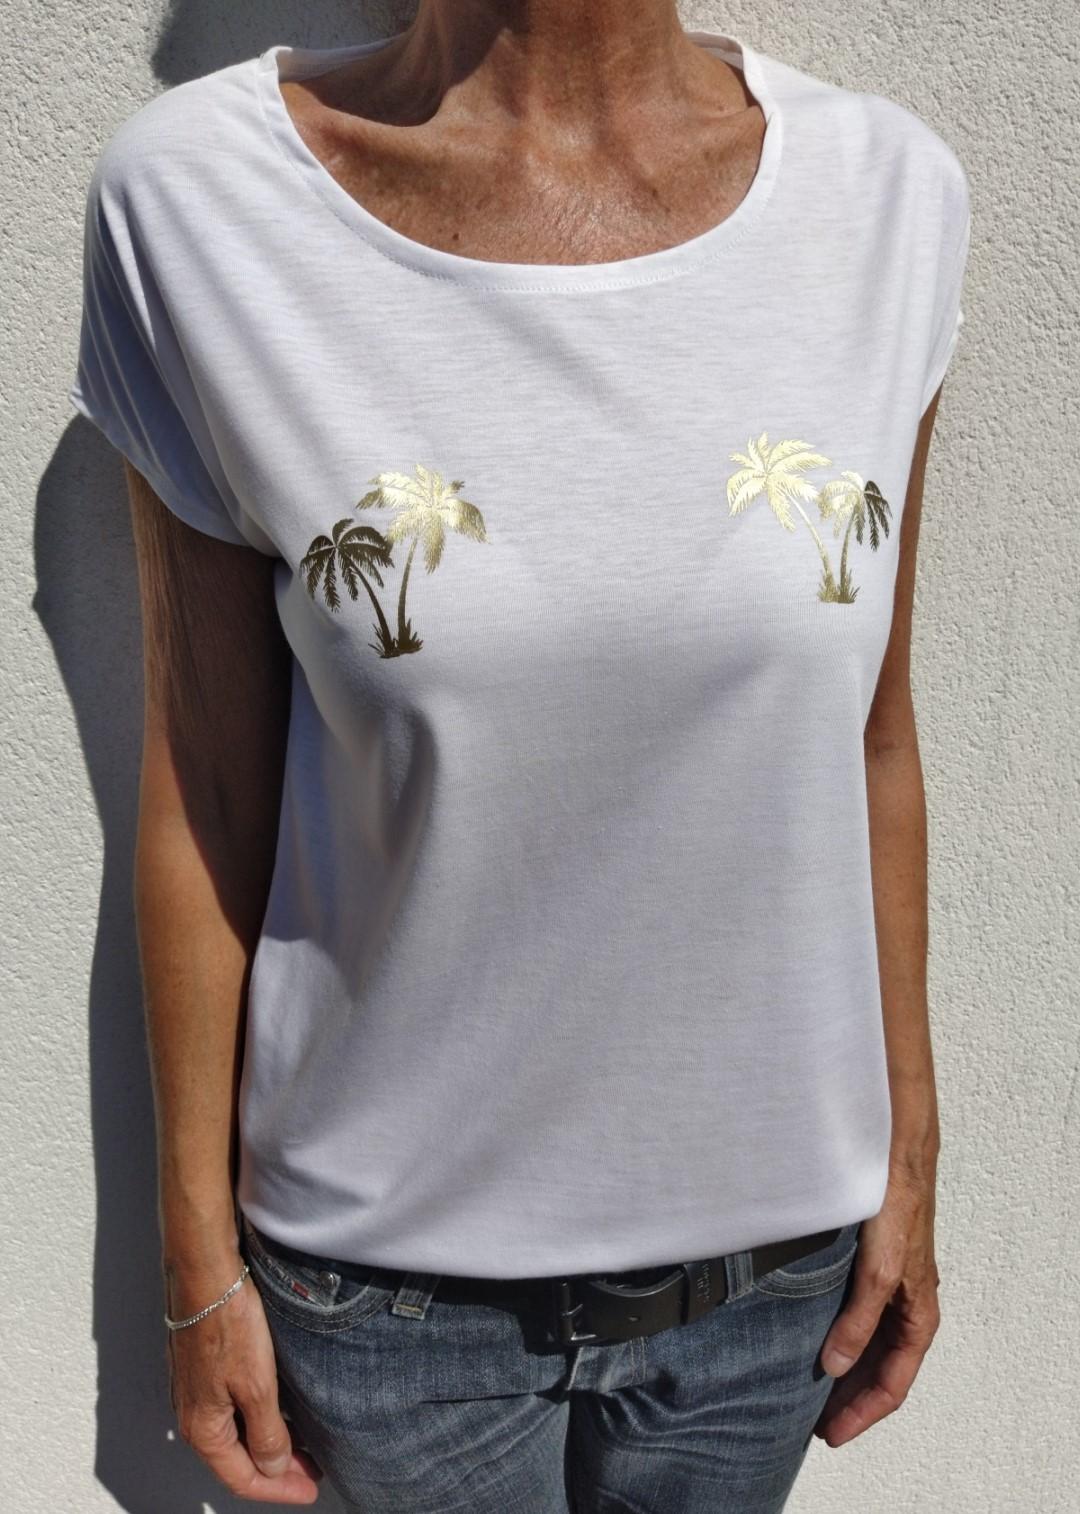 Tee shirt blanc N°55 palmiers or